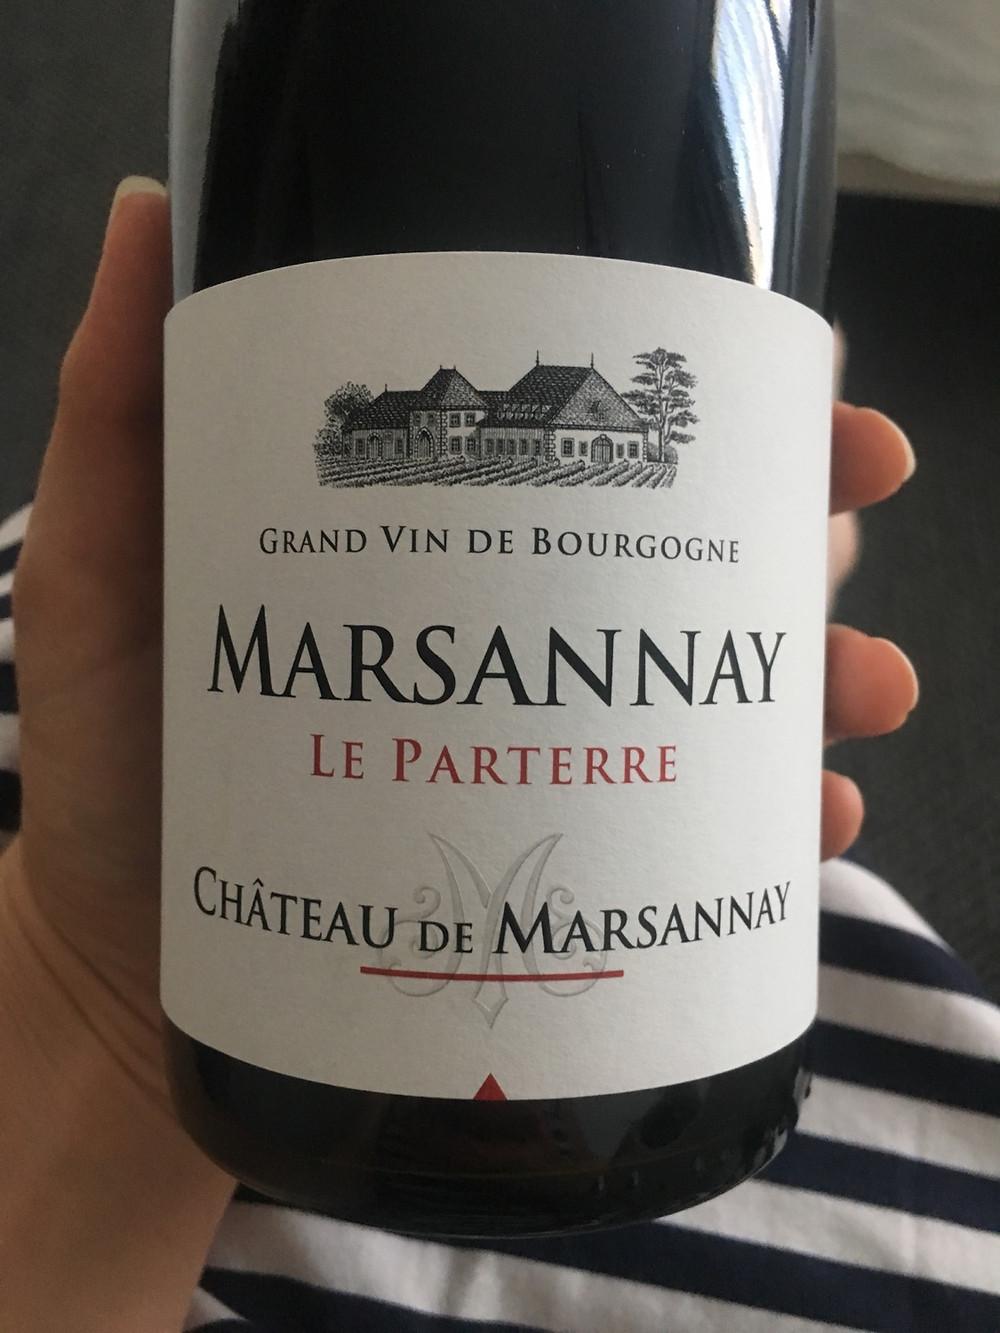 Marsannay Le Parterre